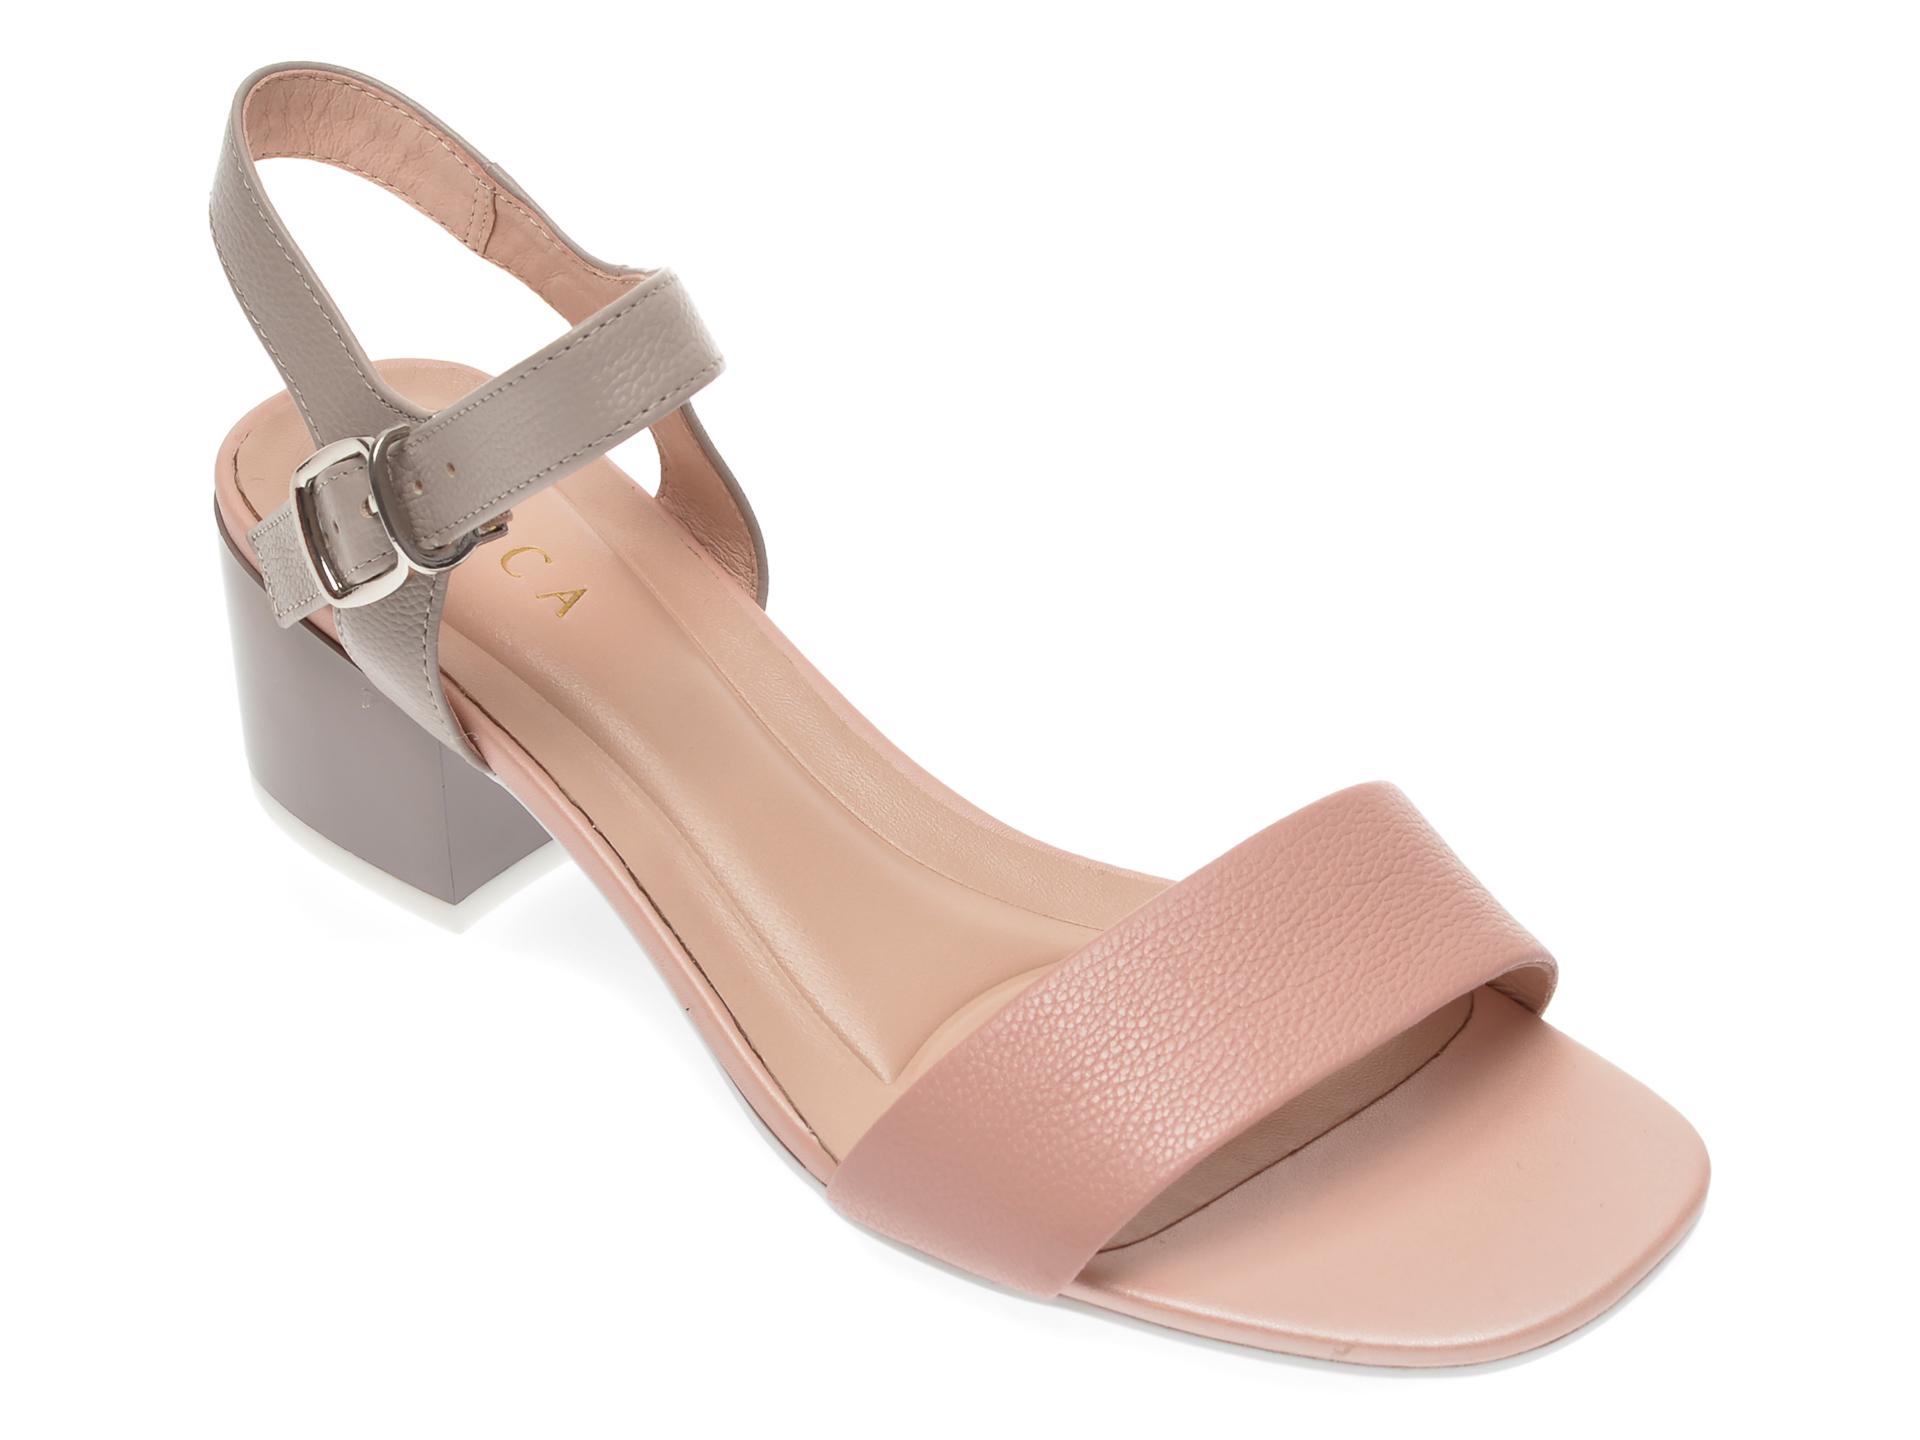 Sandale EPICA roz, CL035A6, din piele naturala imagine